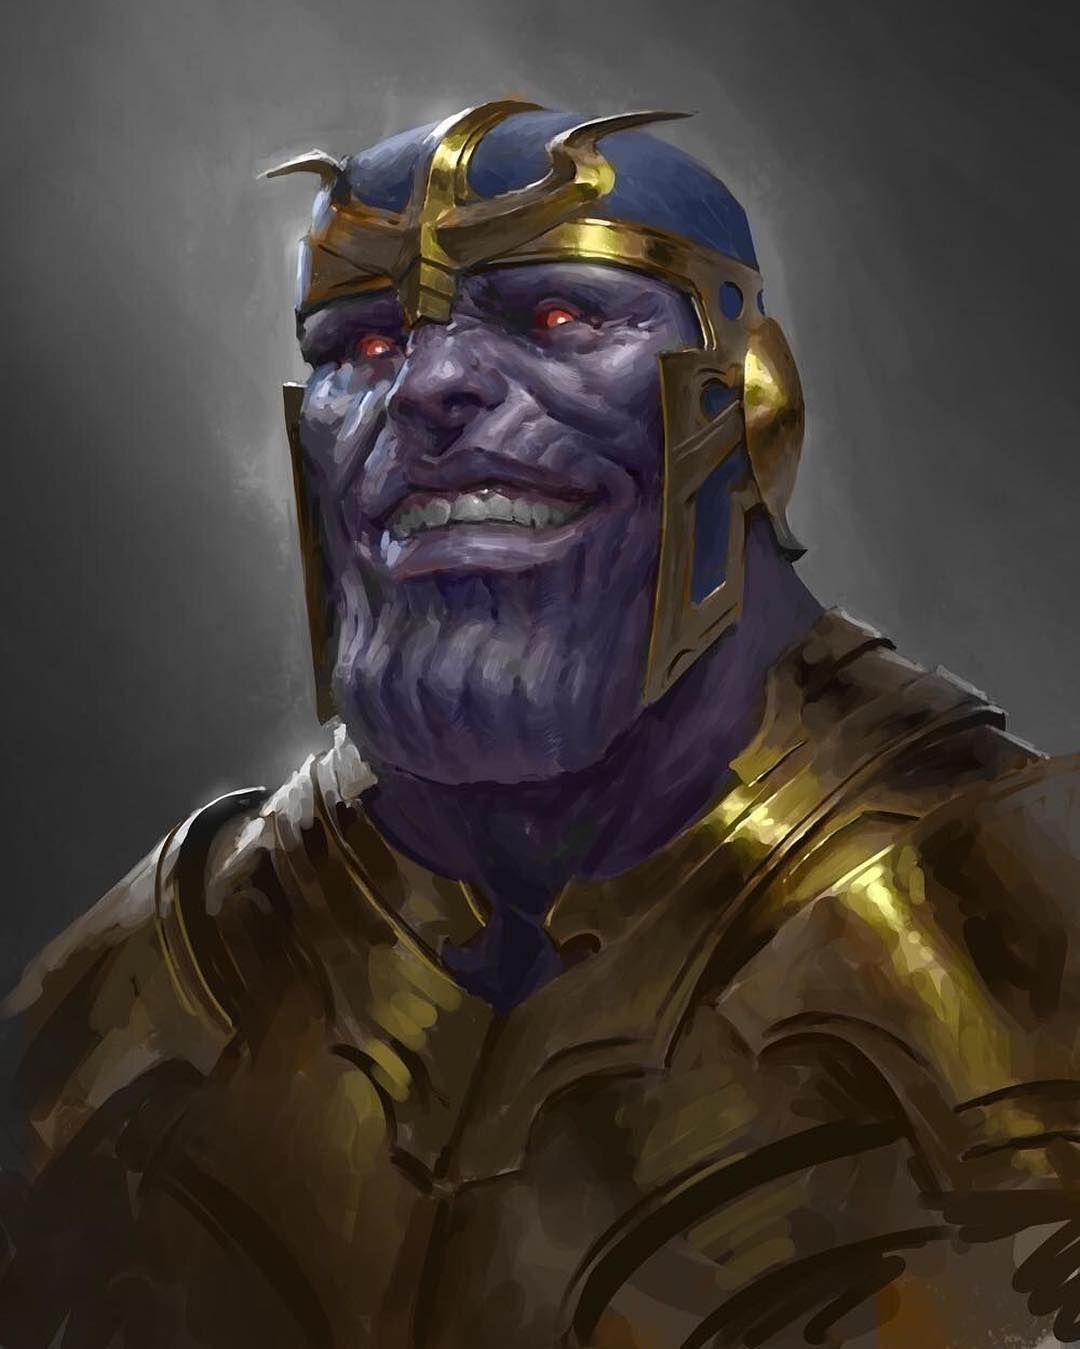 Thanos Fine I'll Do It Myself : thanos, myself, Fine,, Myself.